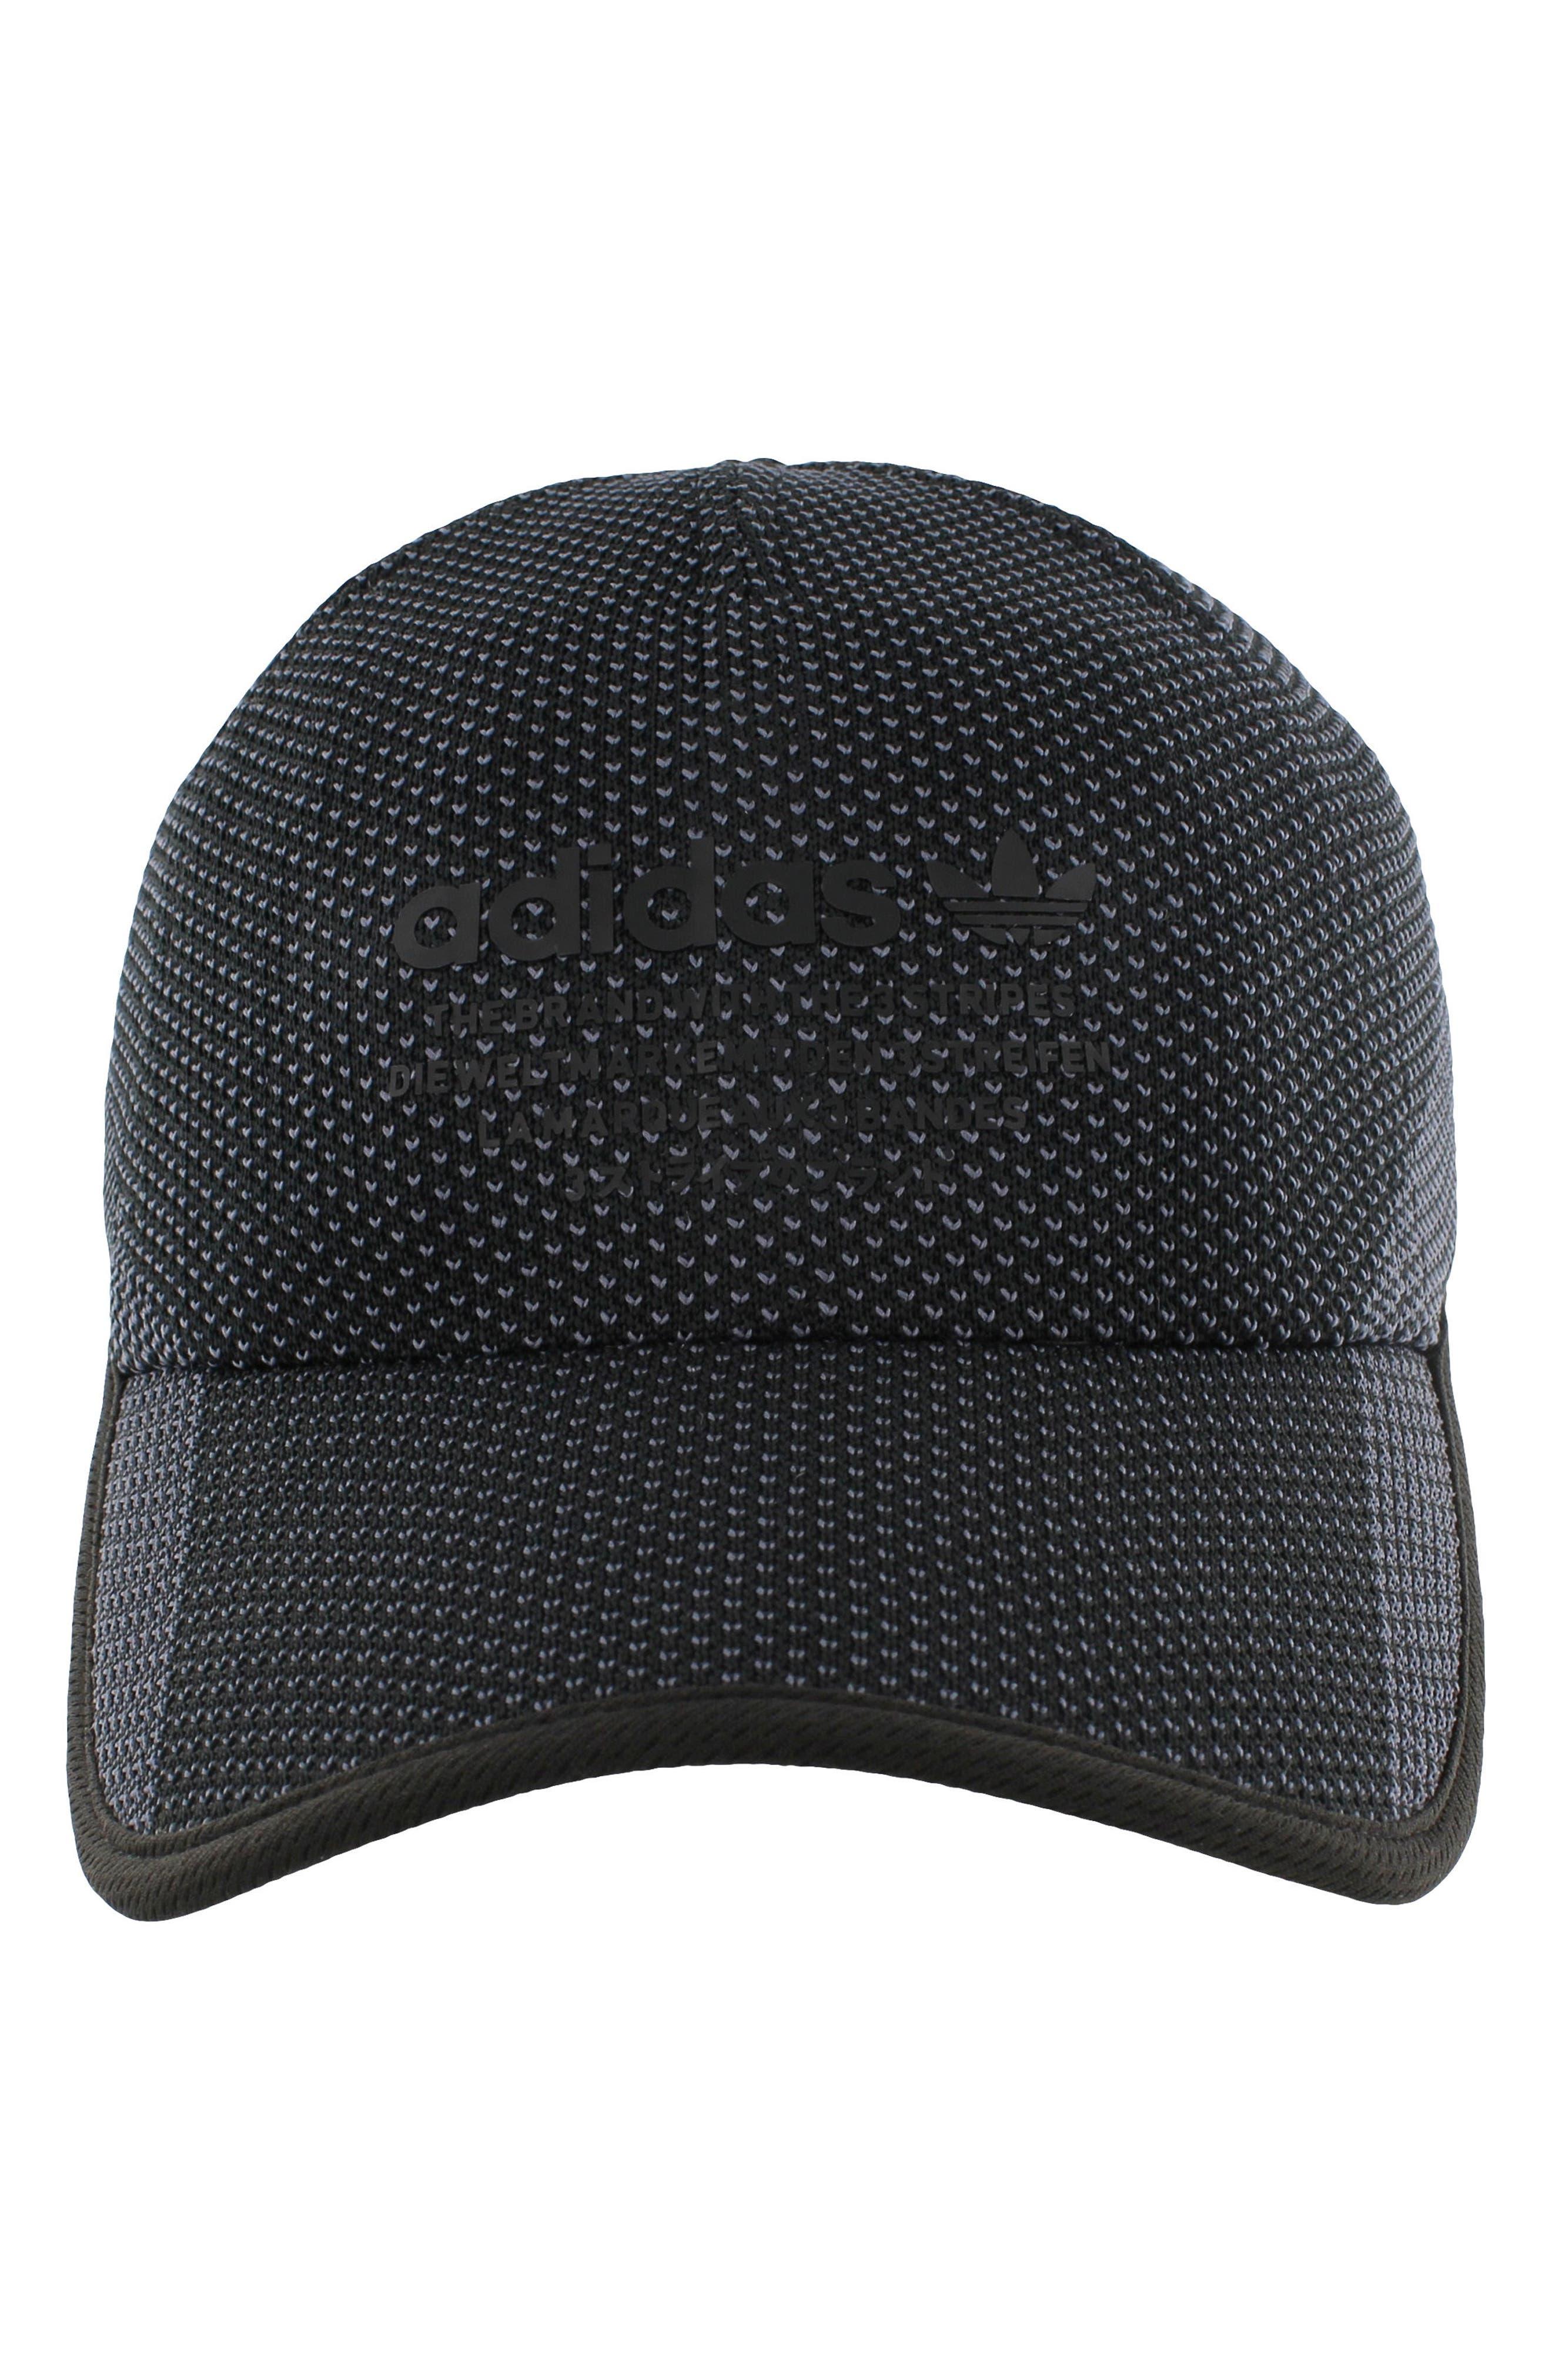 NMD Prime Ball Cap,                             Alternate thumbnail 4, color,                             Black